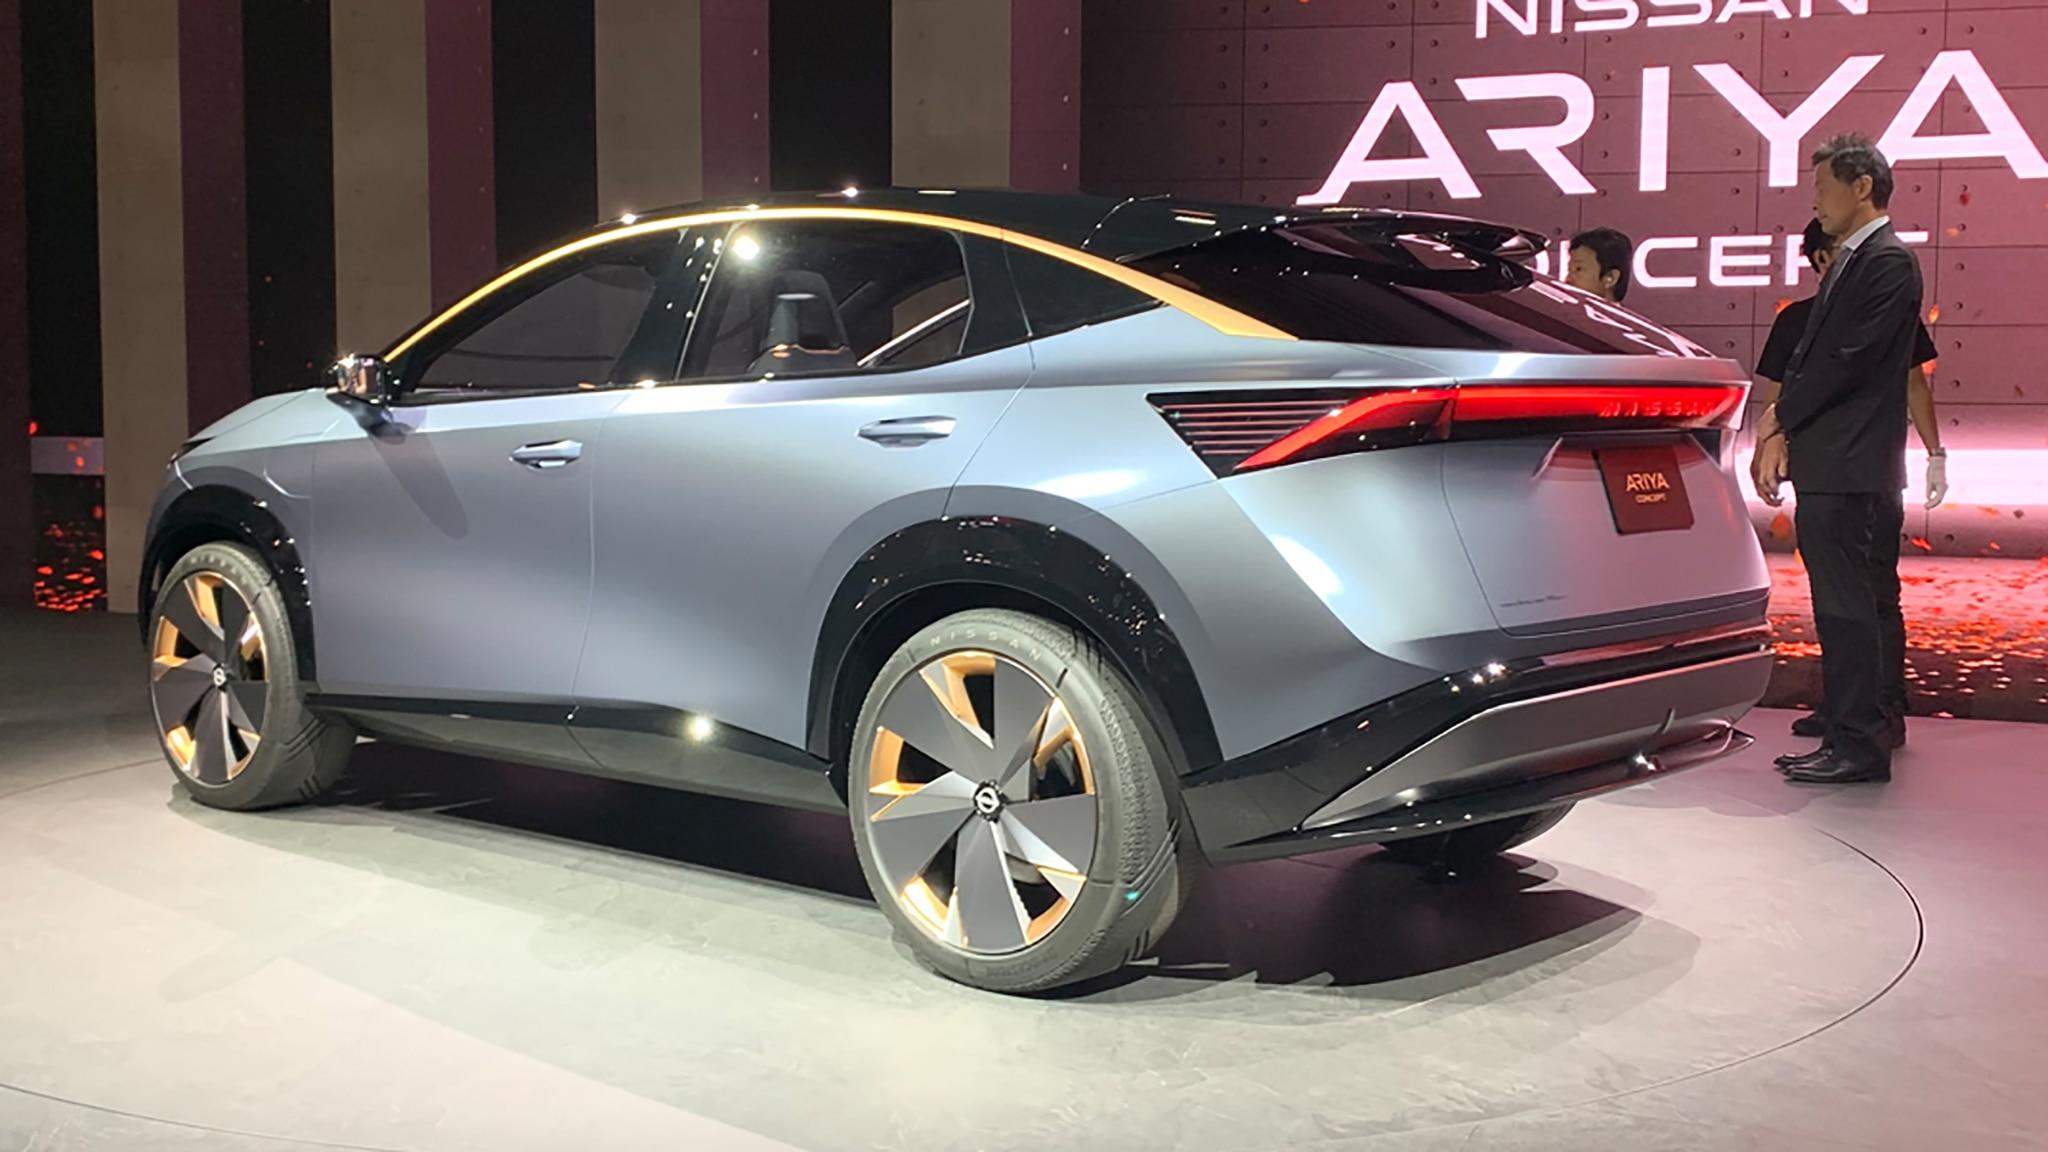 Best Ev Cars >> Nissan's Ariya EV SUV Concept Is Basically Production-Ready | Automobile Magazine - Automobile